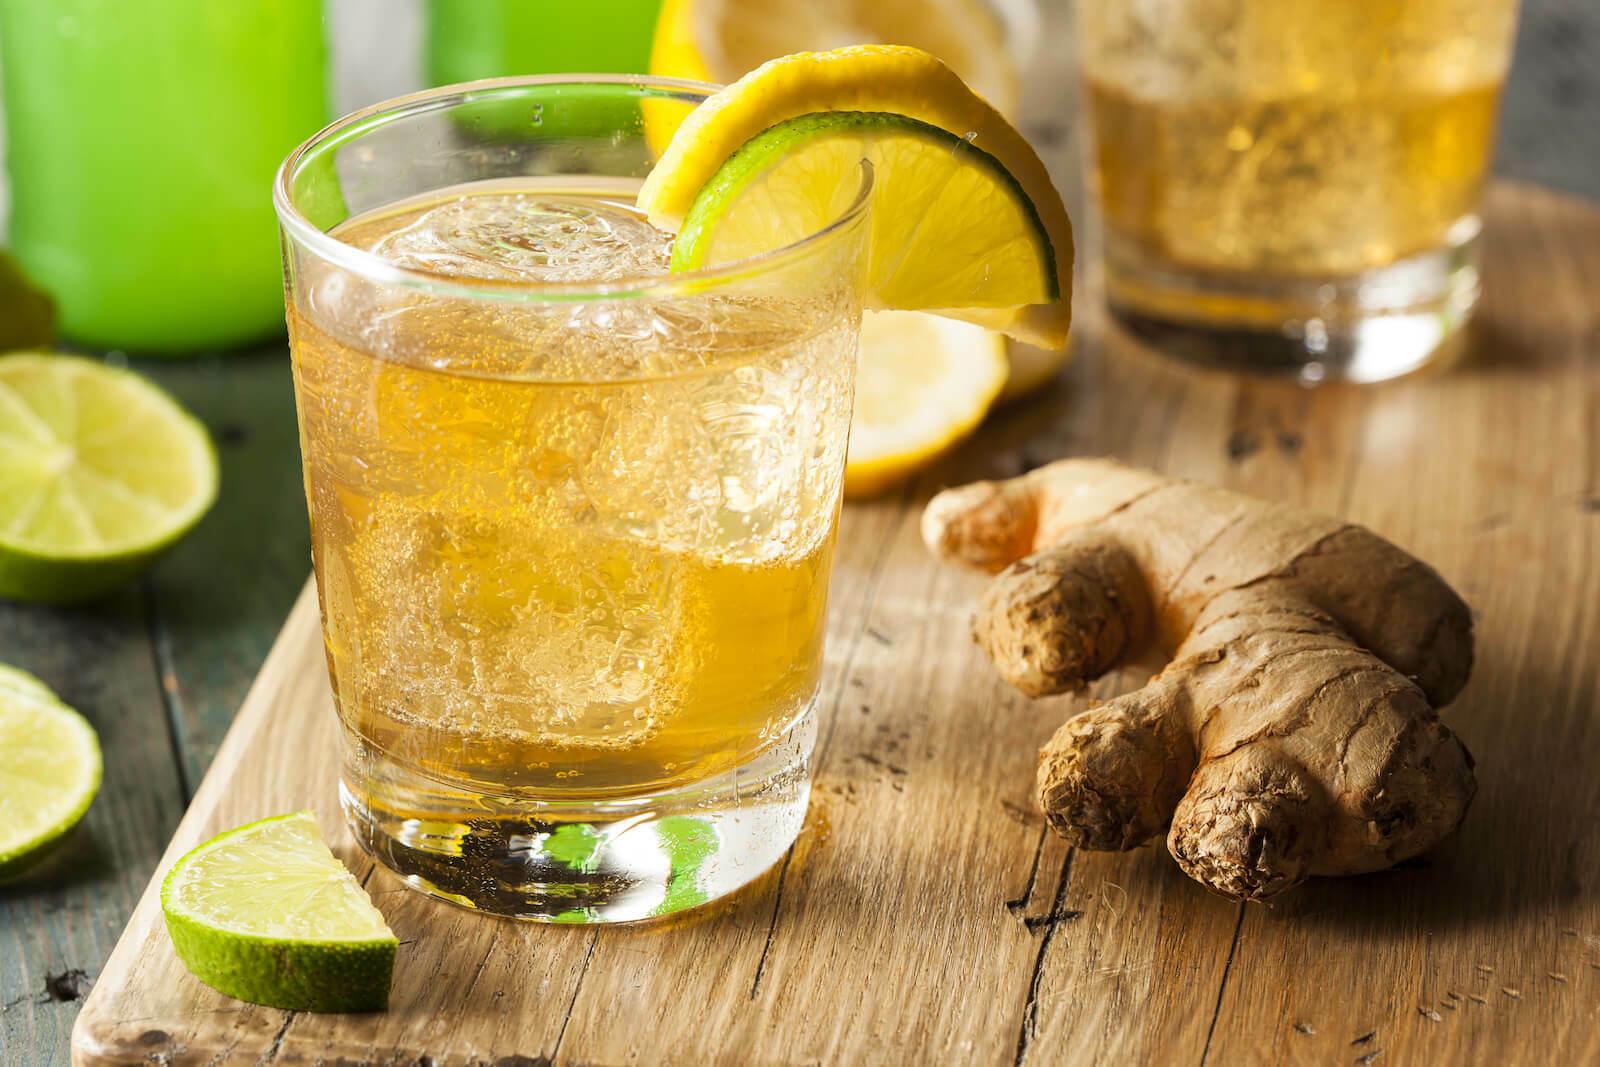 Ginger ale benefits: Organic ginger ale soda